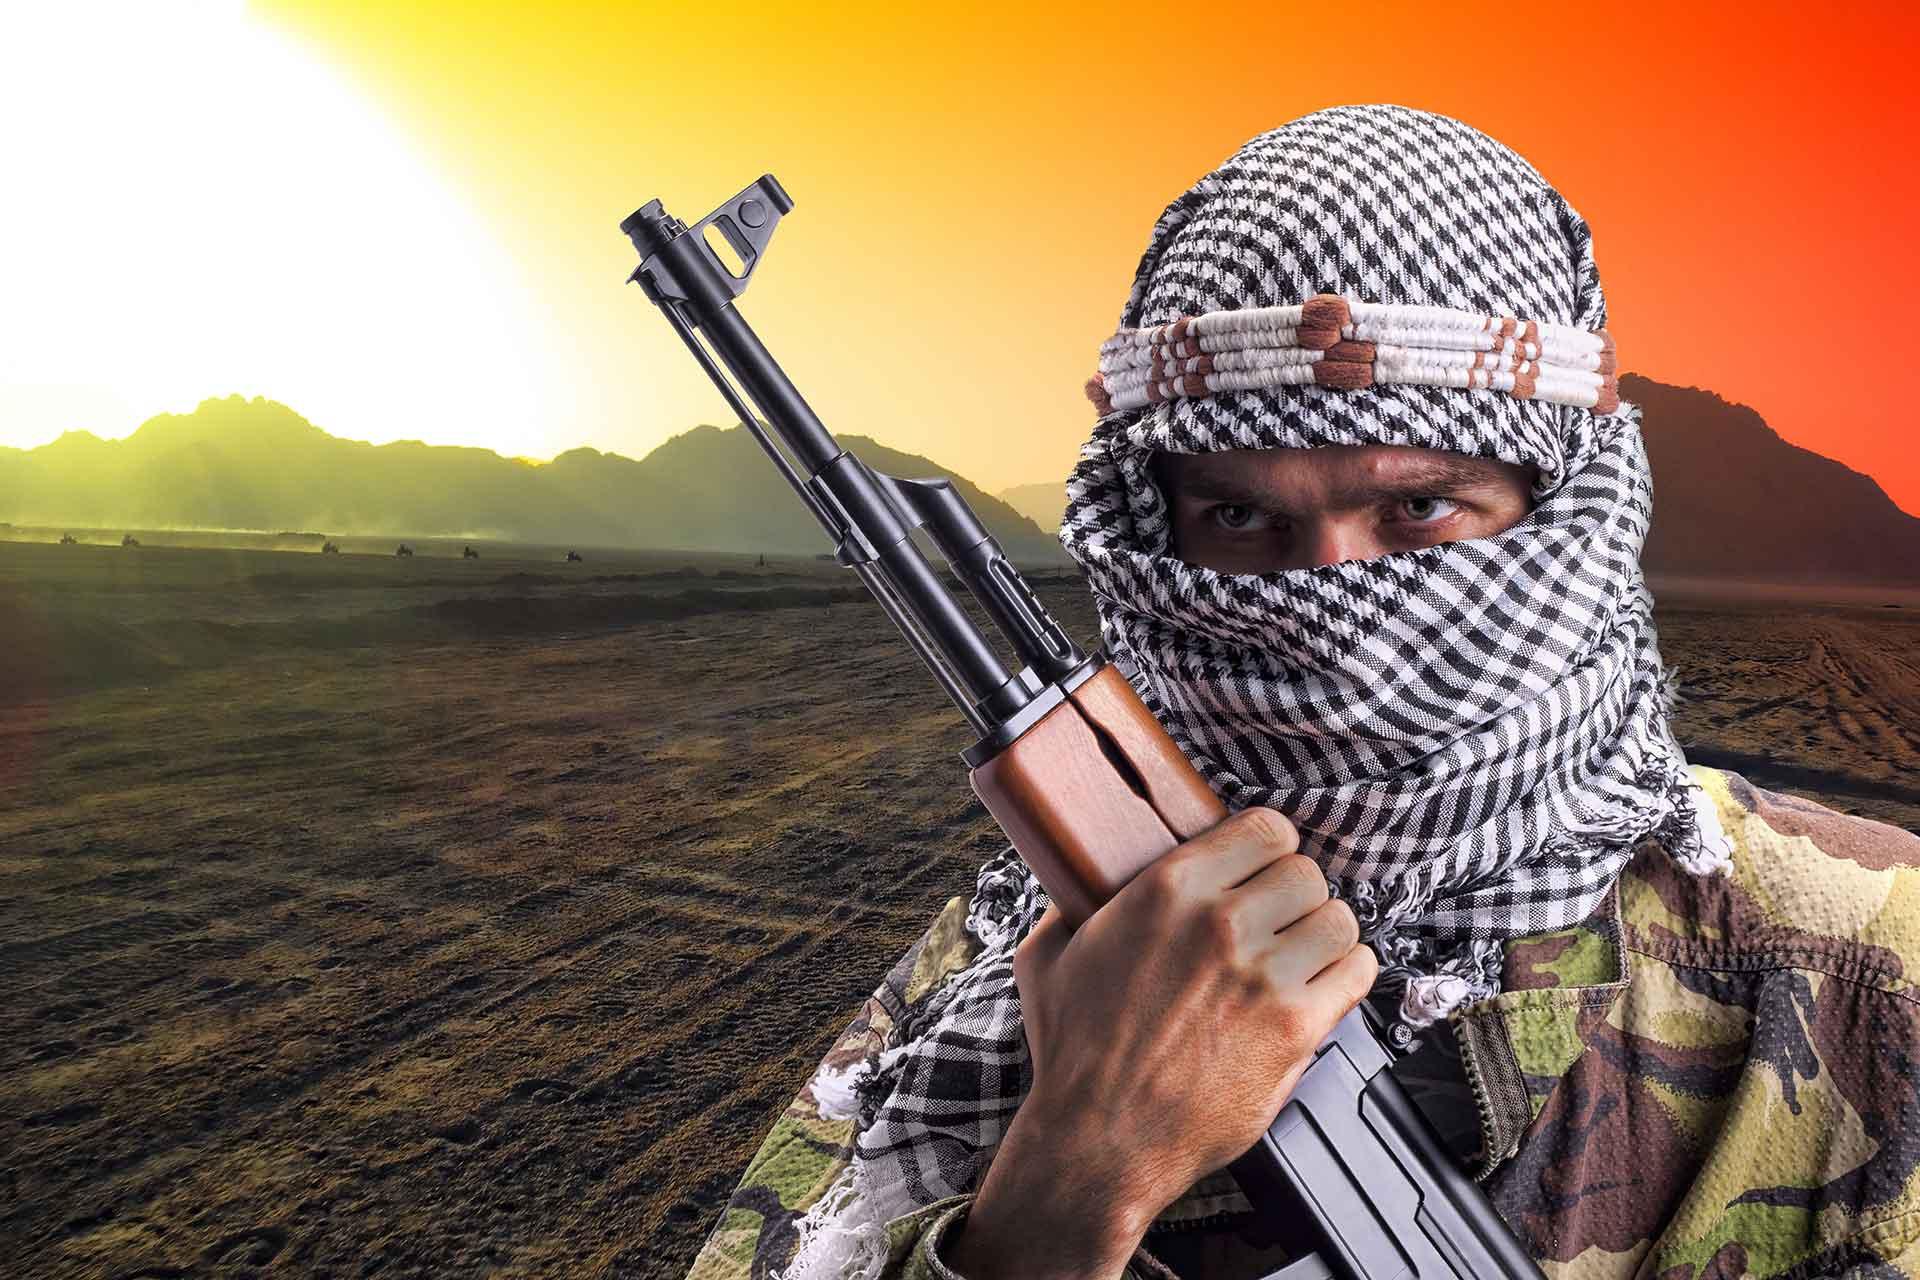 Terrorisme strafrecht advocaat - Weening Strafrechtadvocaten